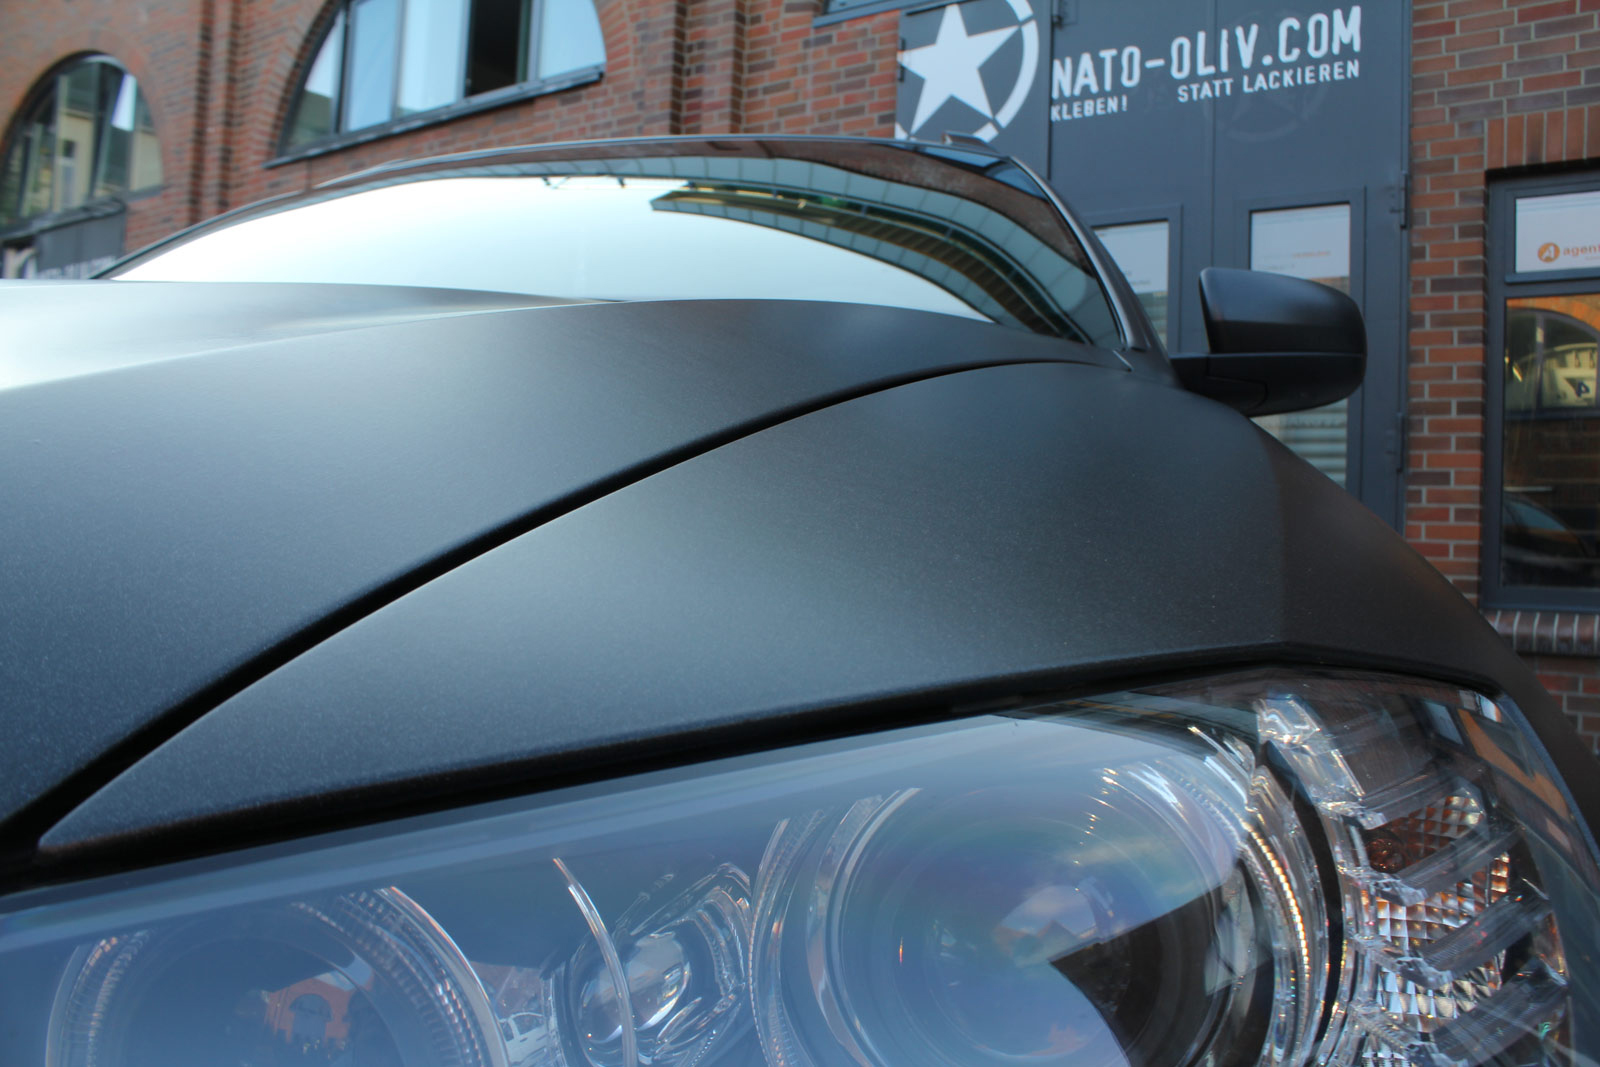 BMW_X6_FOLIERUNG_SCHWARZ_METALLIC_MATT_10